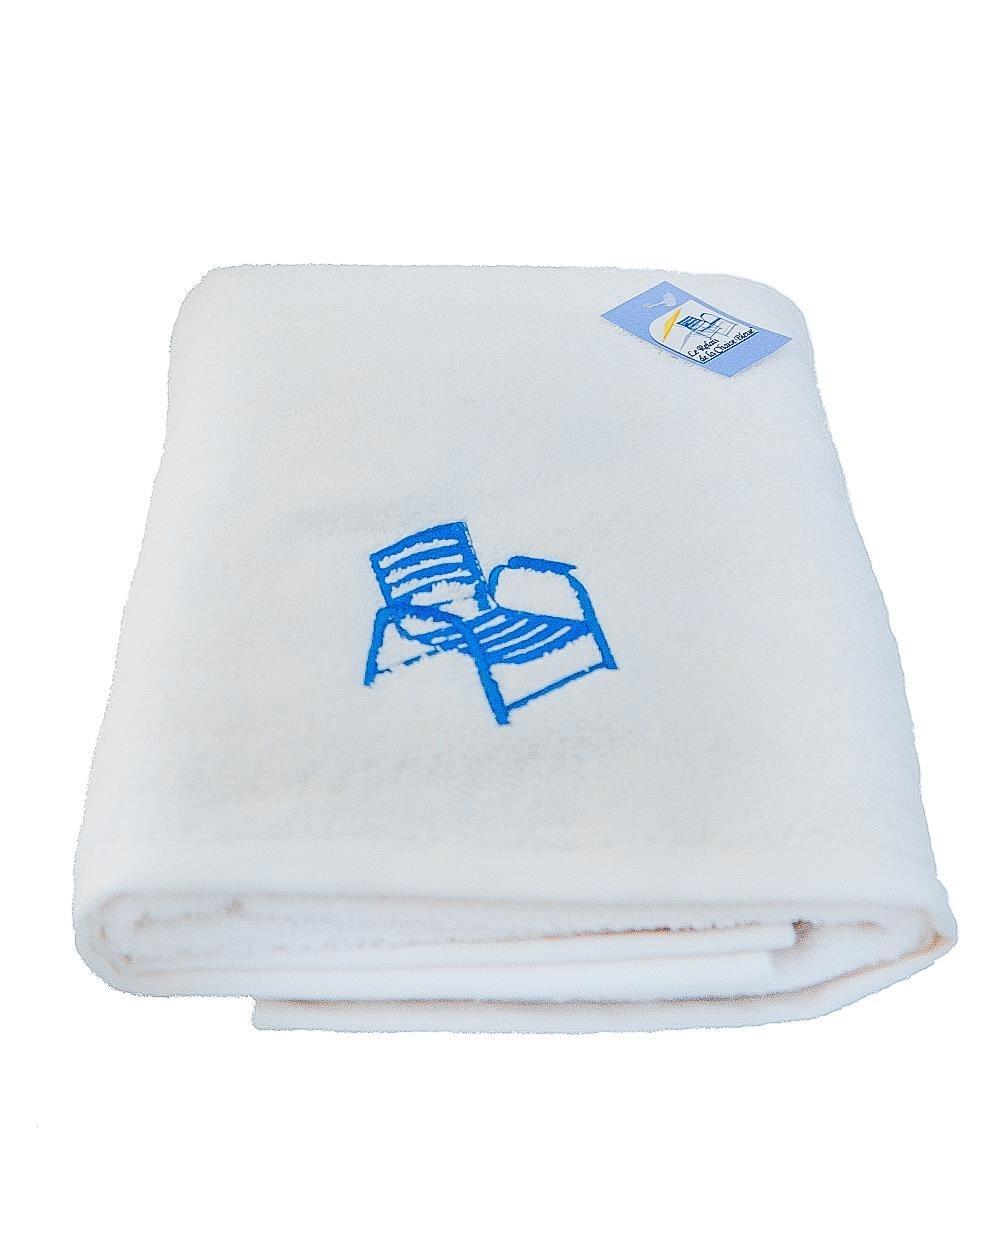 drap de bain blanc 70x140 cm. Black Bedroom Furniture Sets. Home Design Ideas